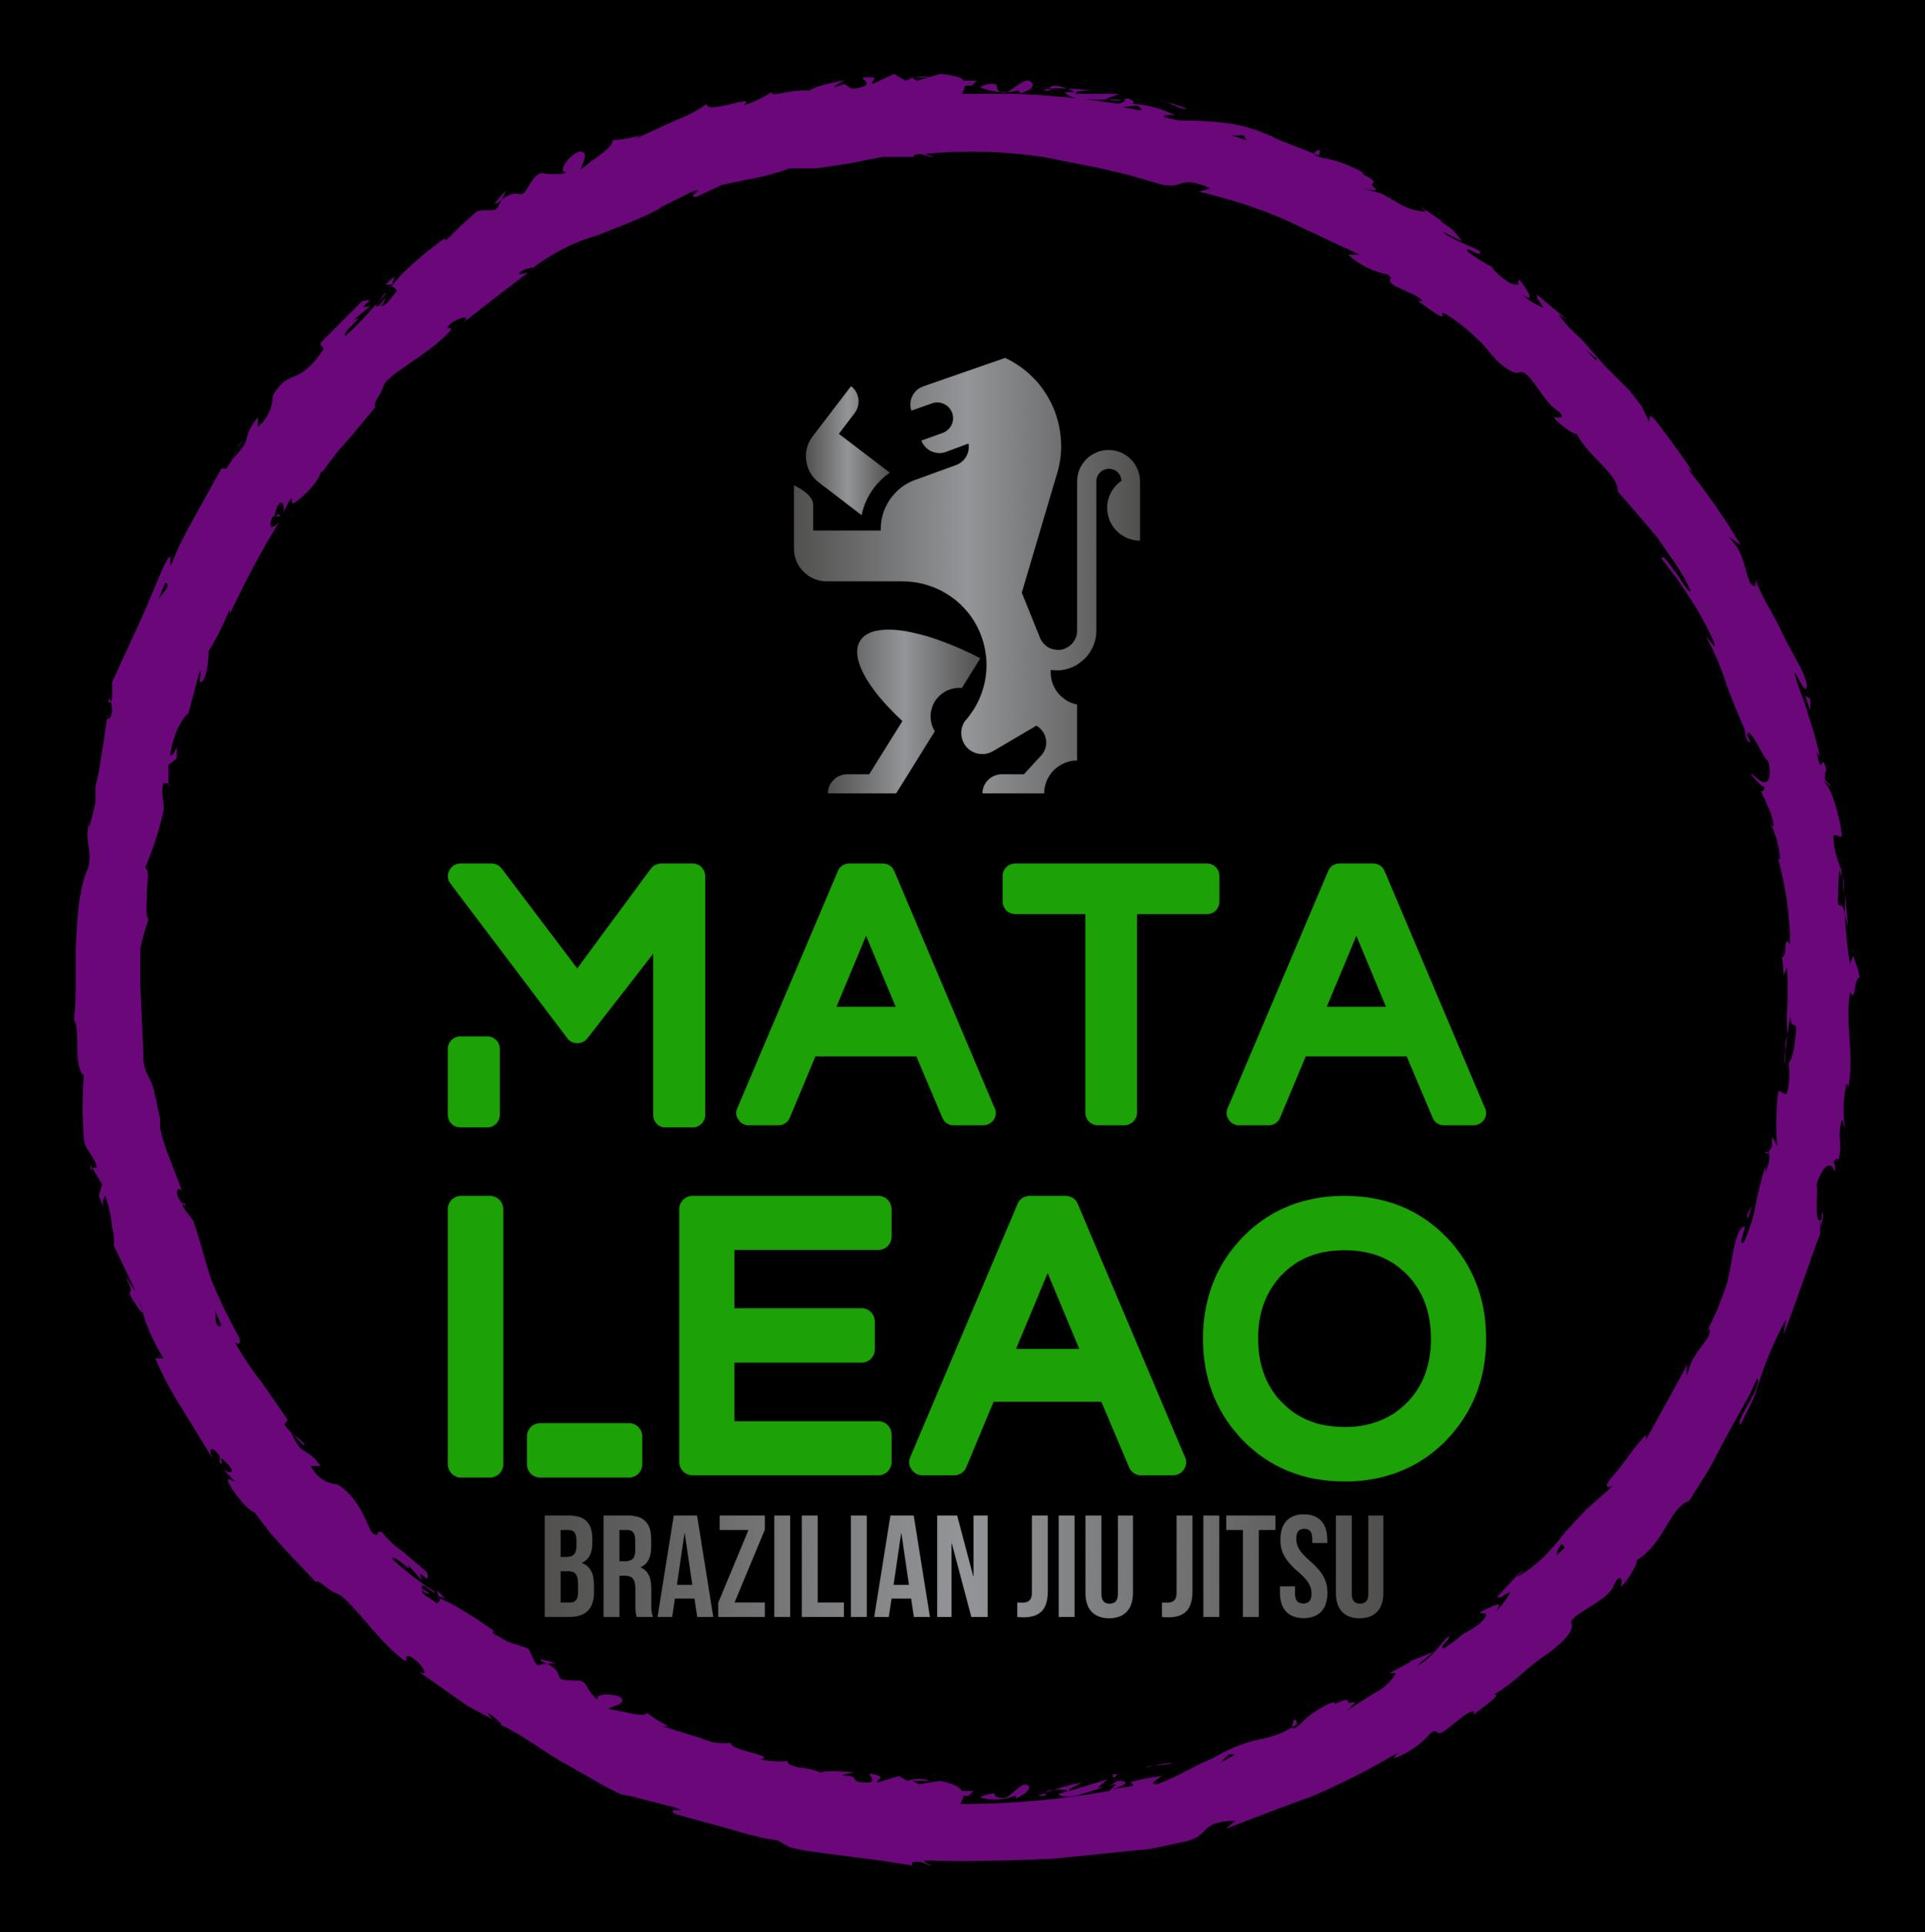 MataLeaoLogo.png